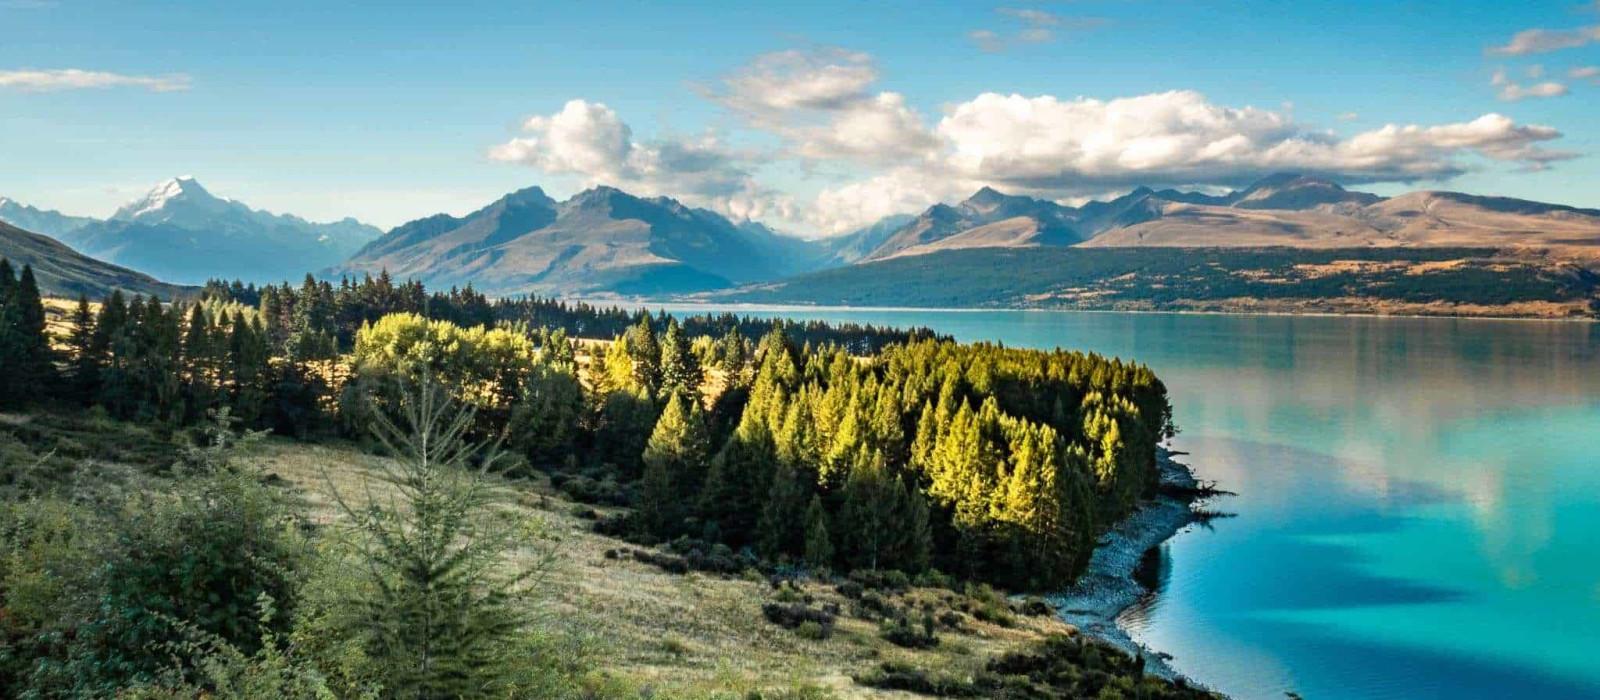 Hotel Valley Views Glamping Otiake New Zealand